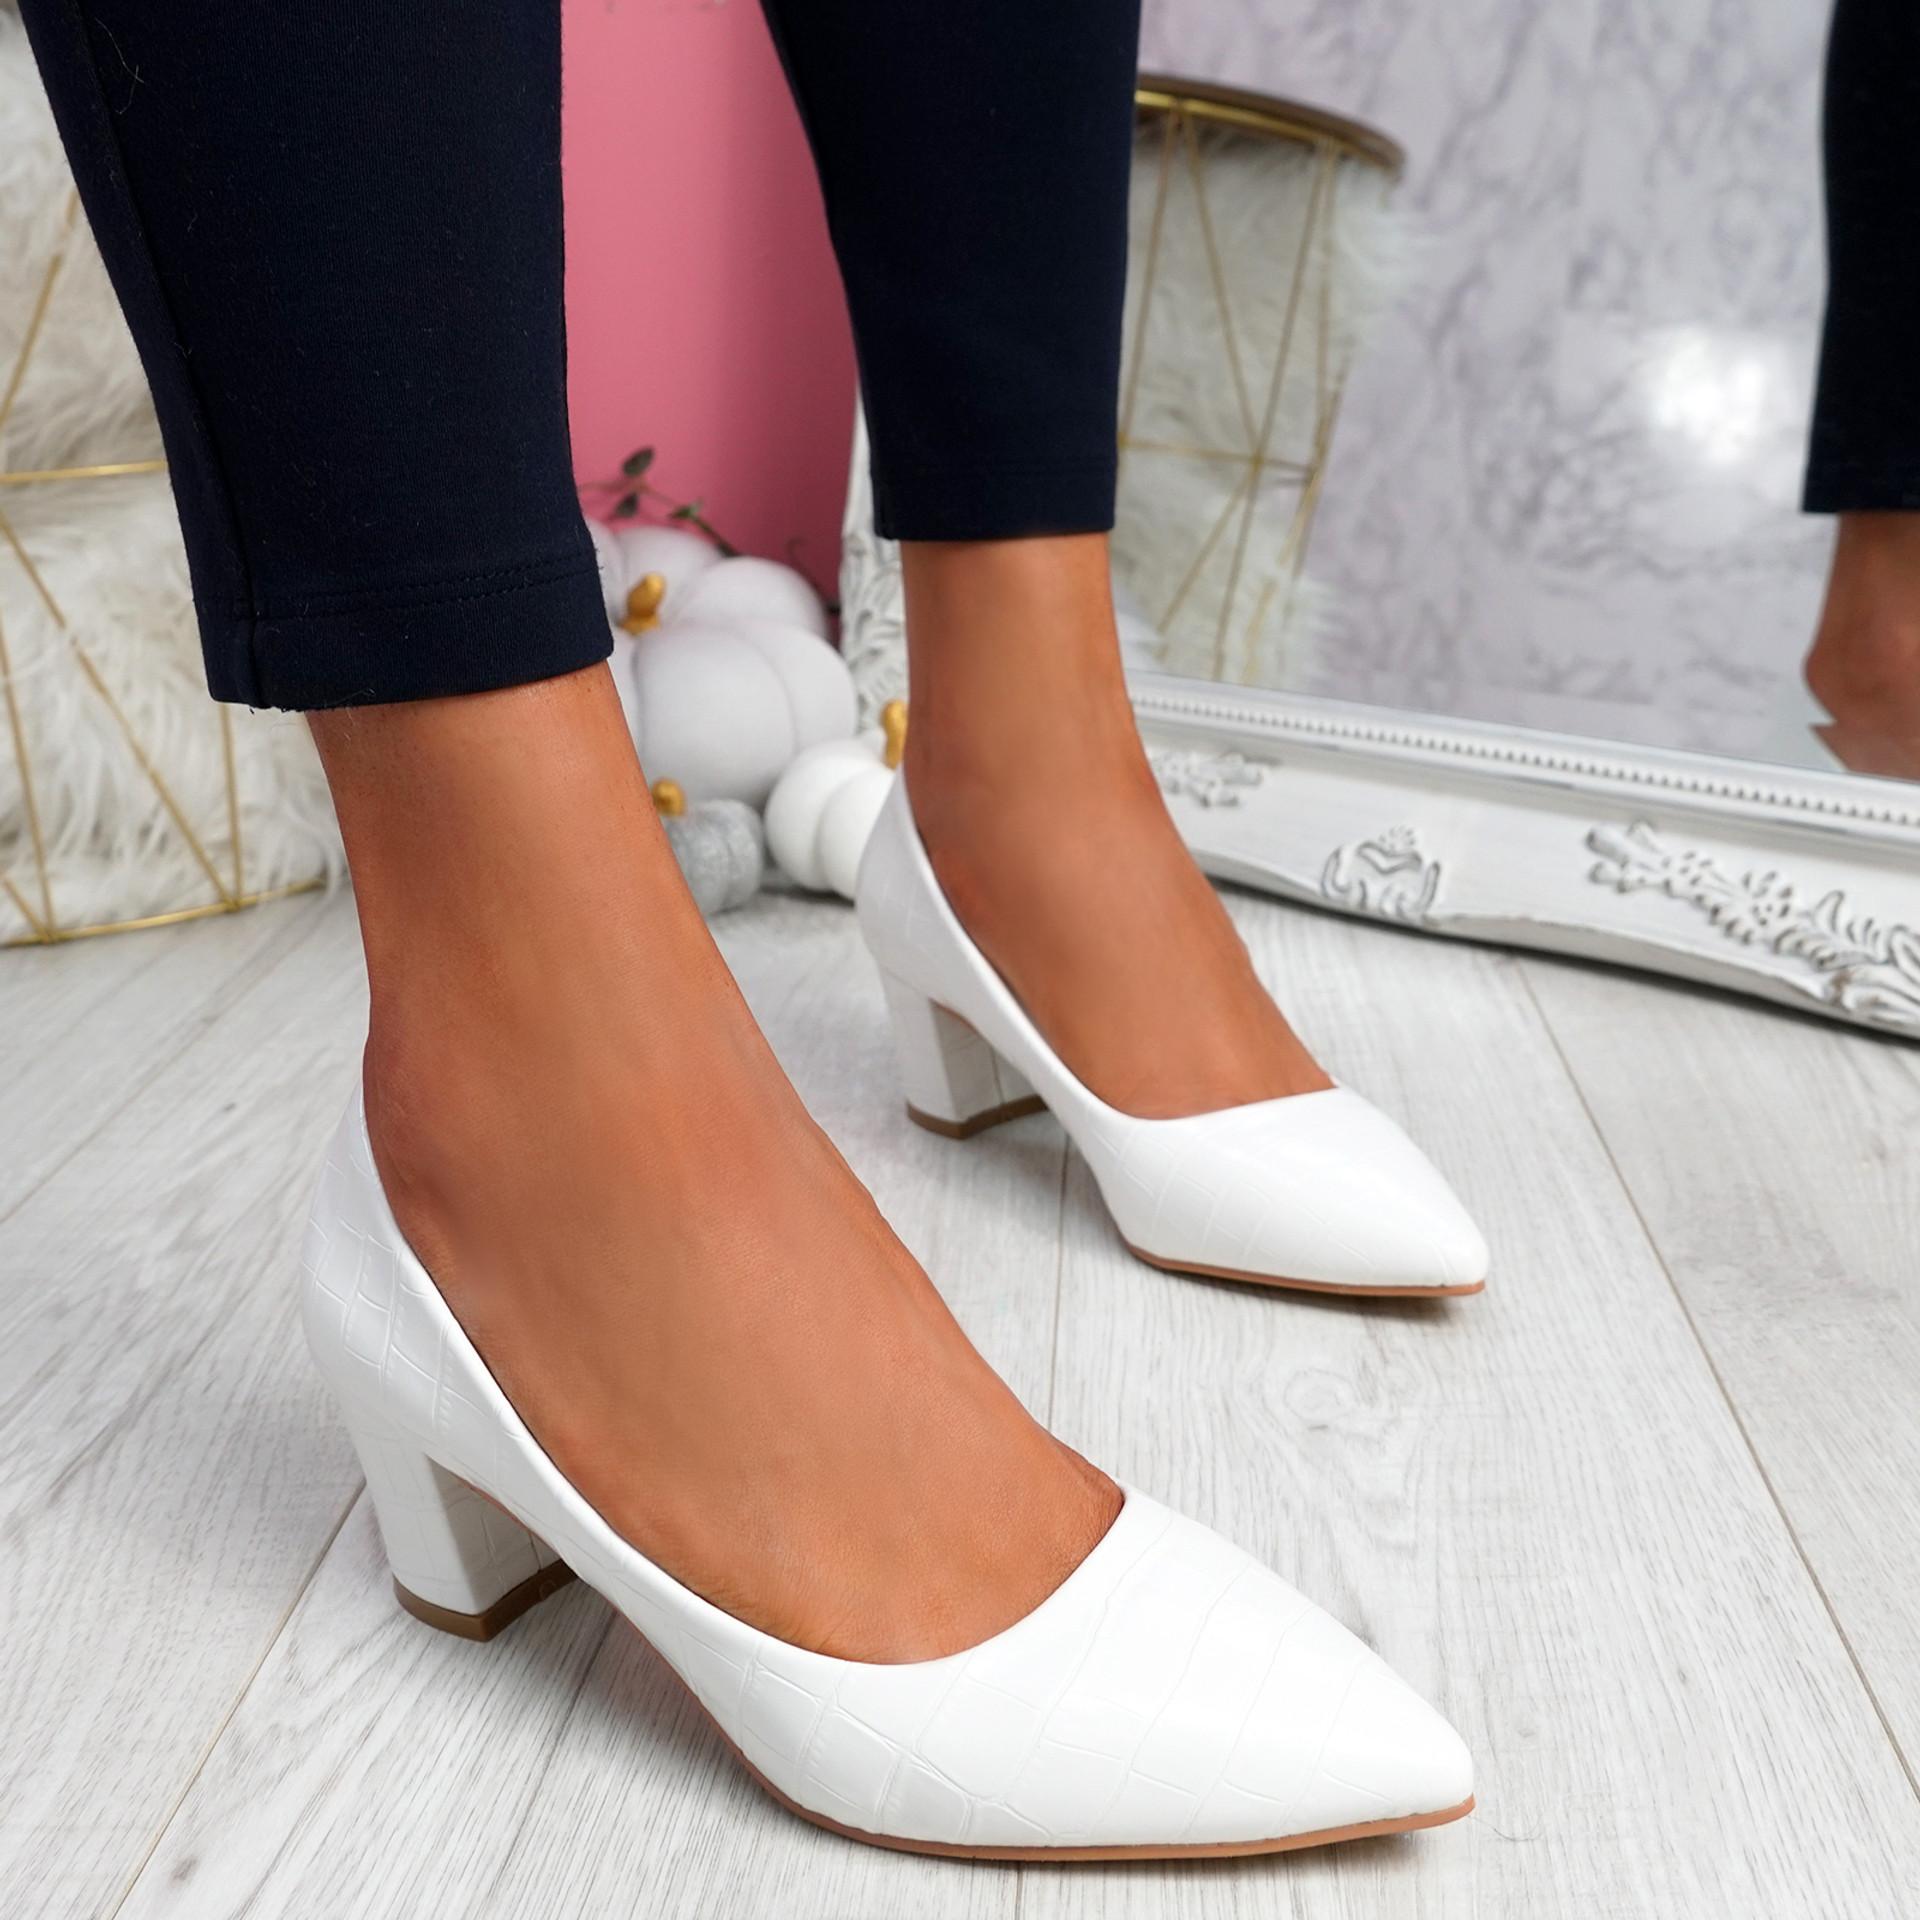 Pressy White Croc Block Heel Pumps